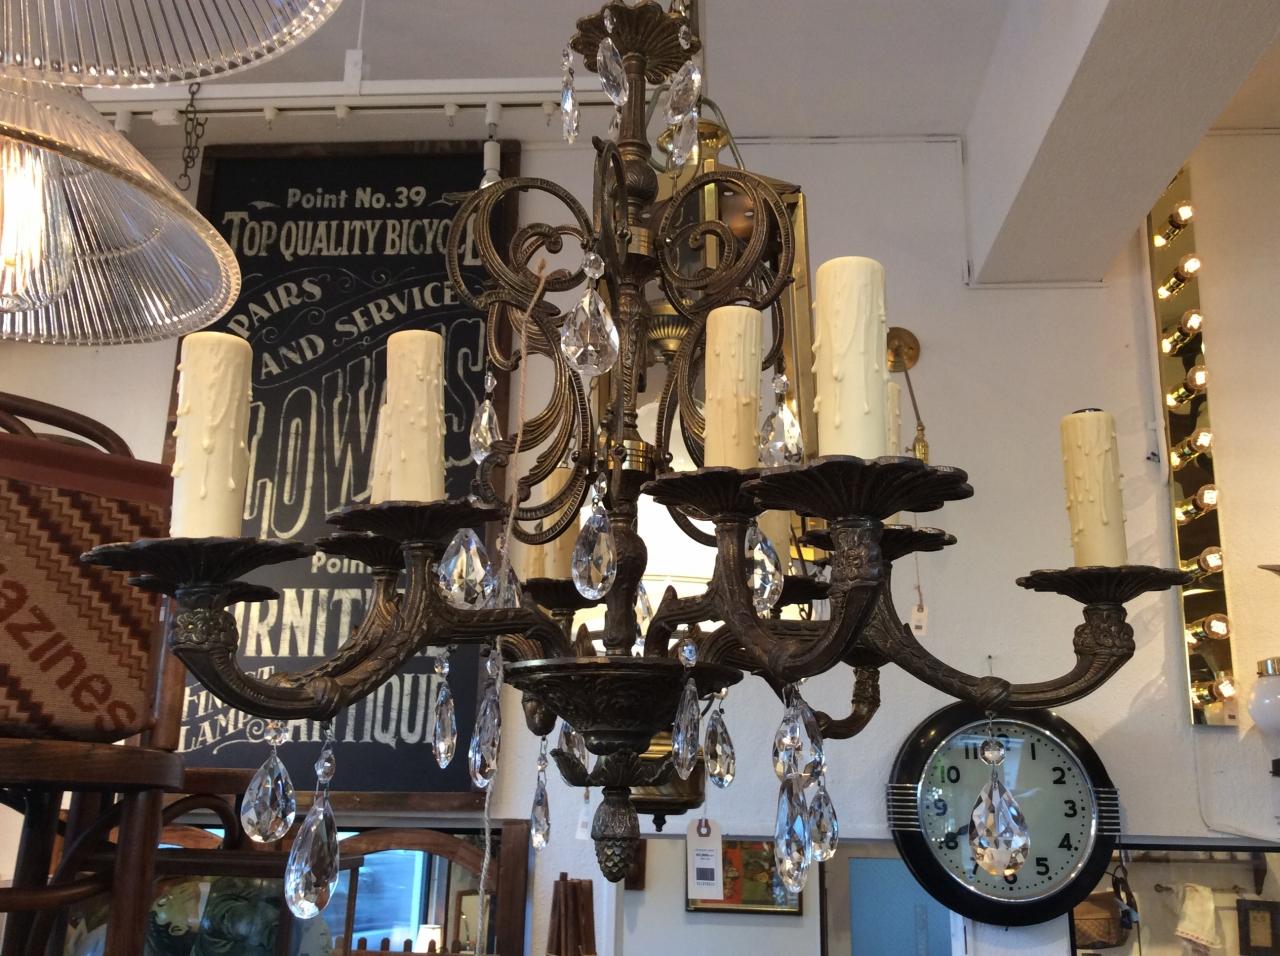 12-bulbs Vintage Chandelier